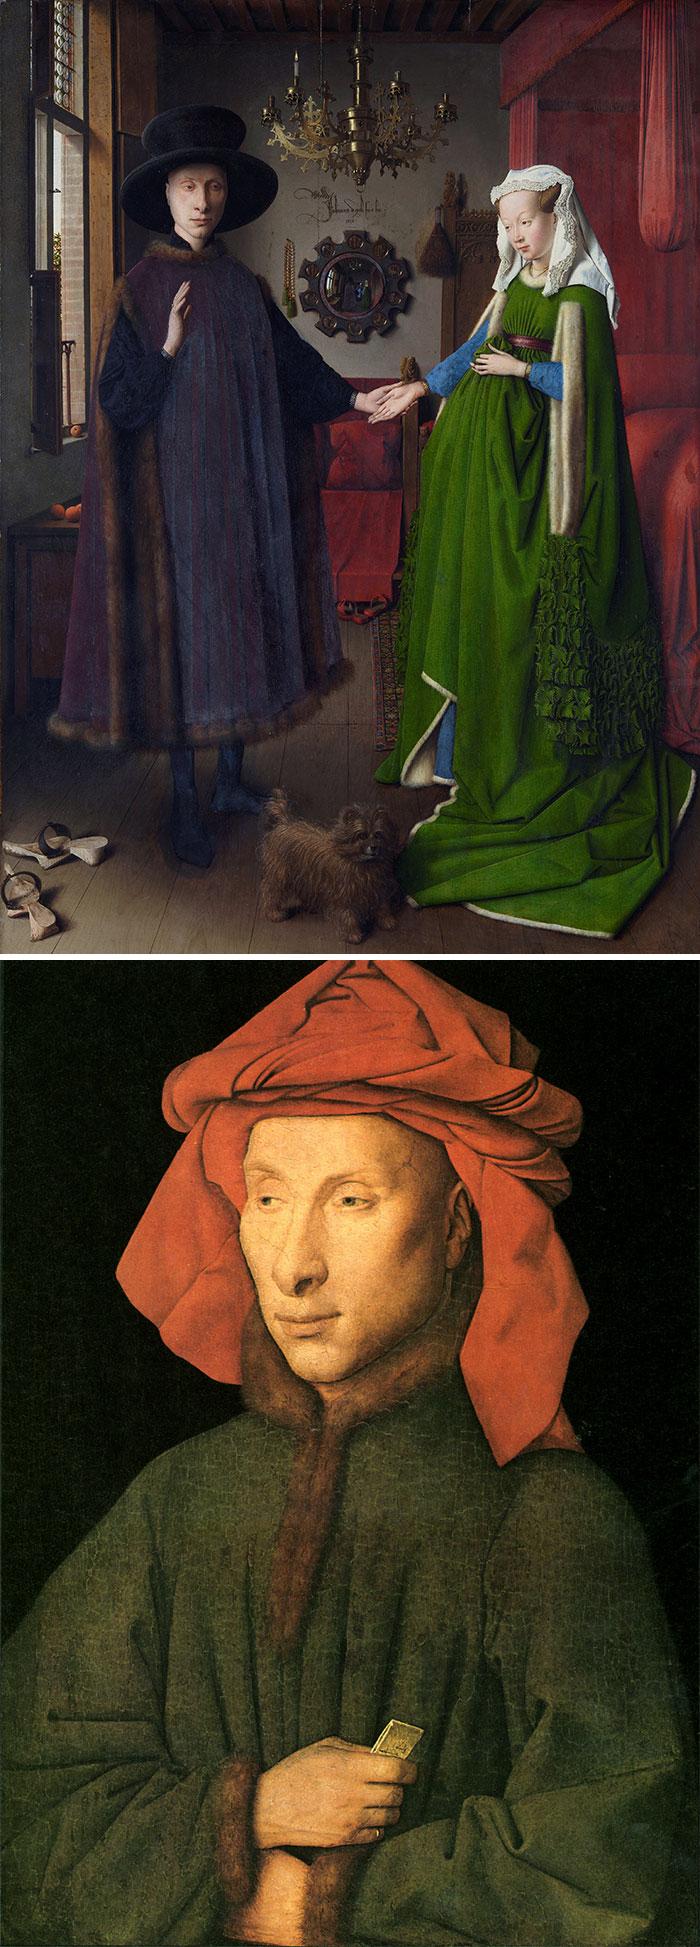 How to identify famous painters - Van Eyck